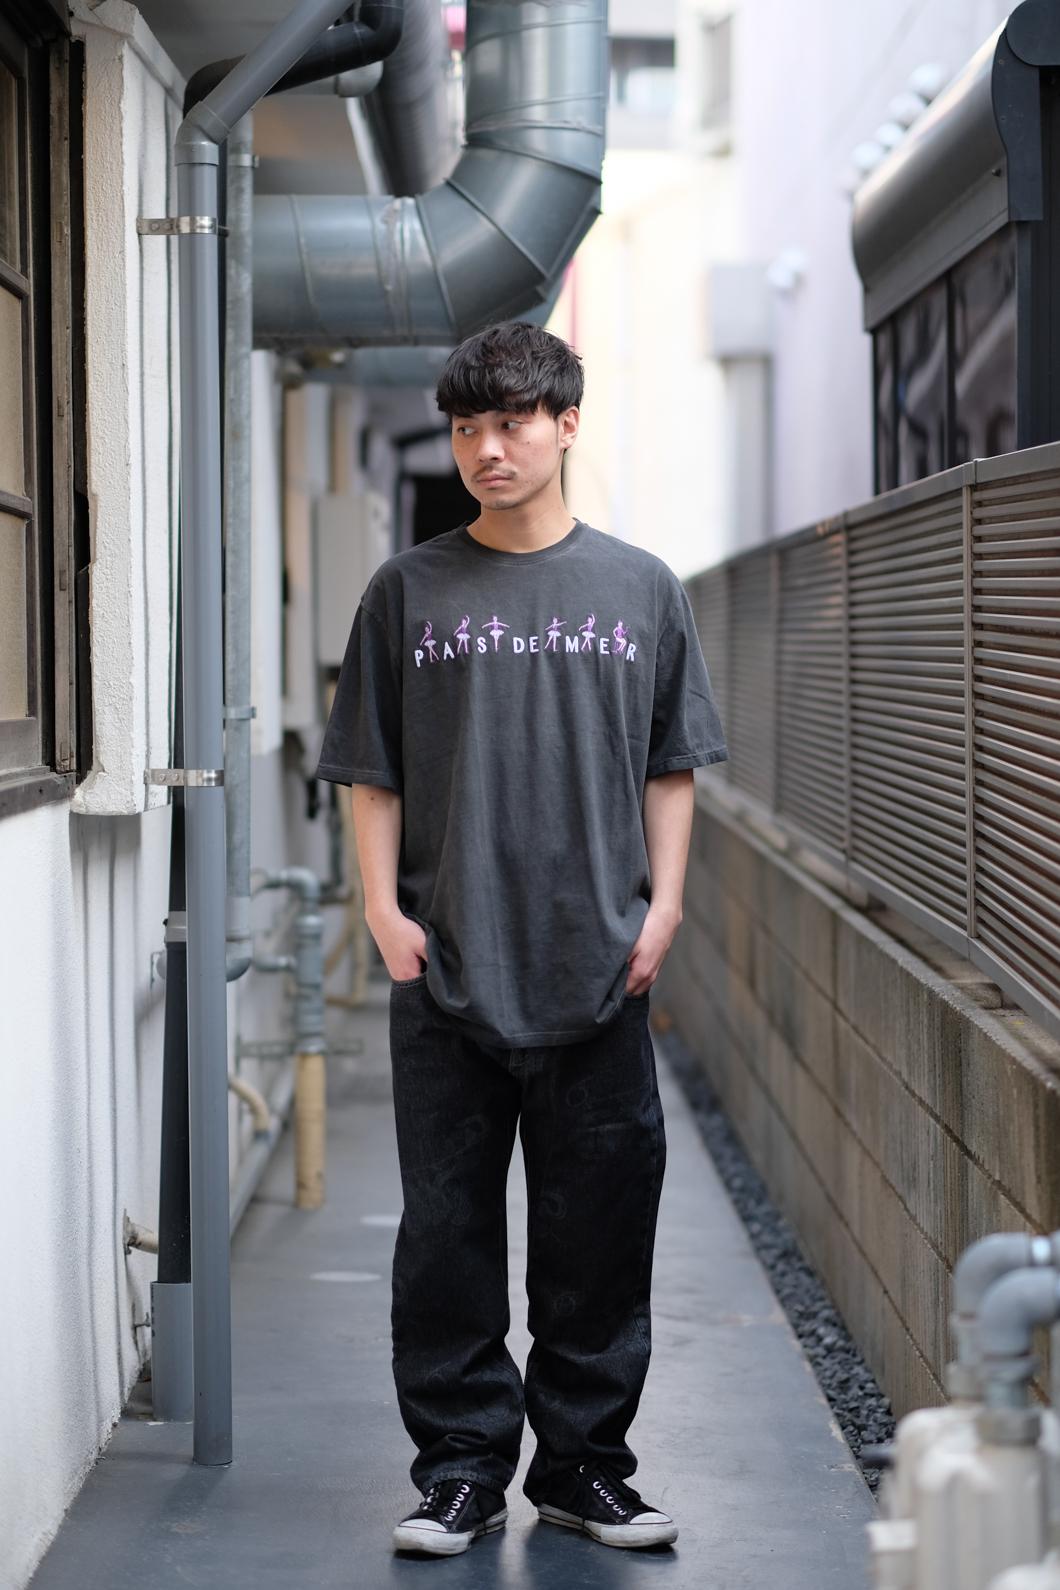 【PAS DE MER/パドゥメ】BALLET T-SHIRT Tシャツ / BLACK